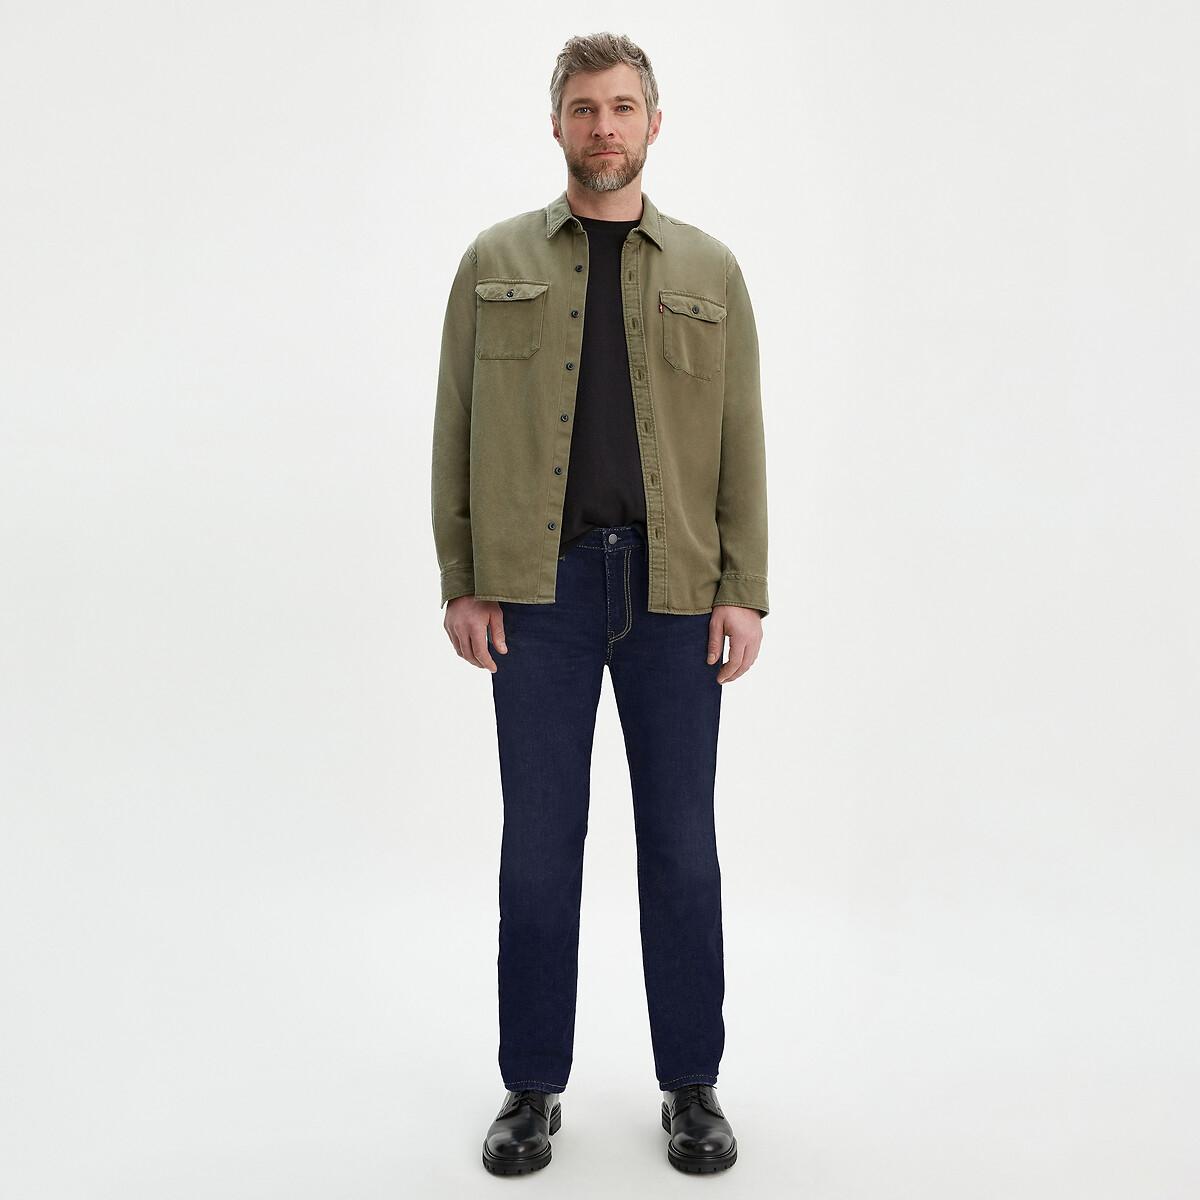 LEVI'S - Levis Jeans direitos justos, straight 514